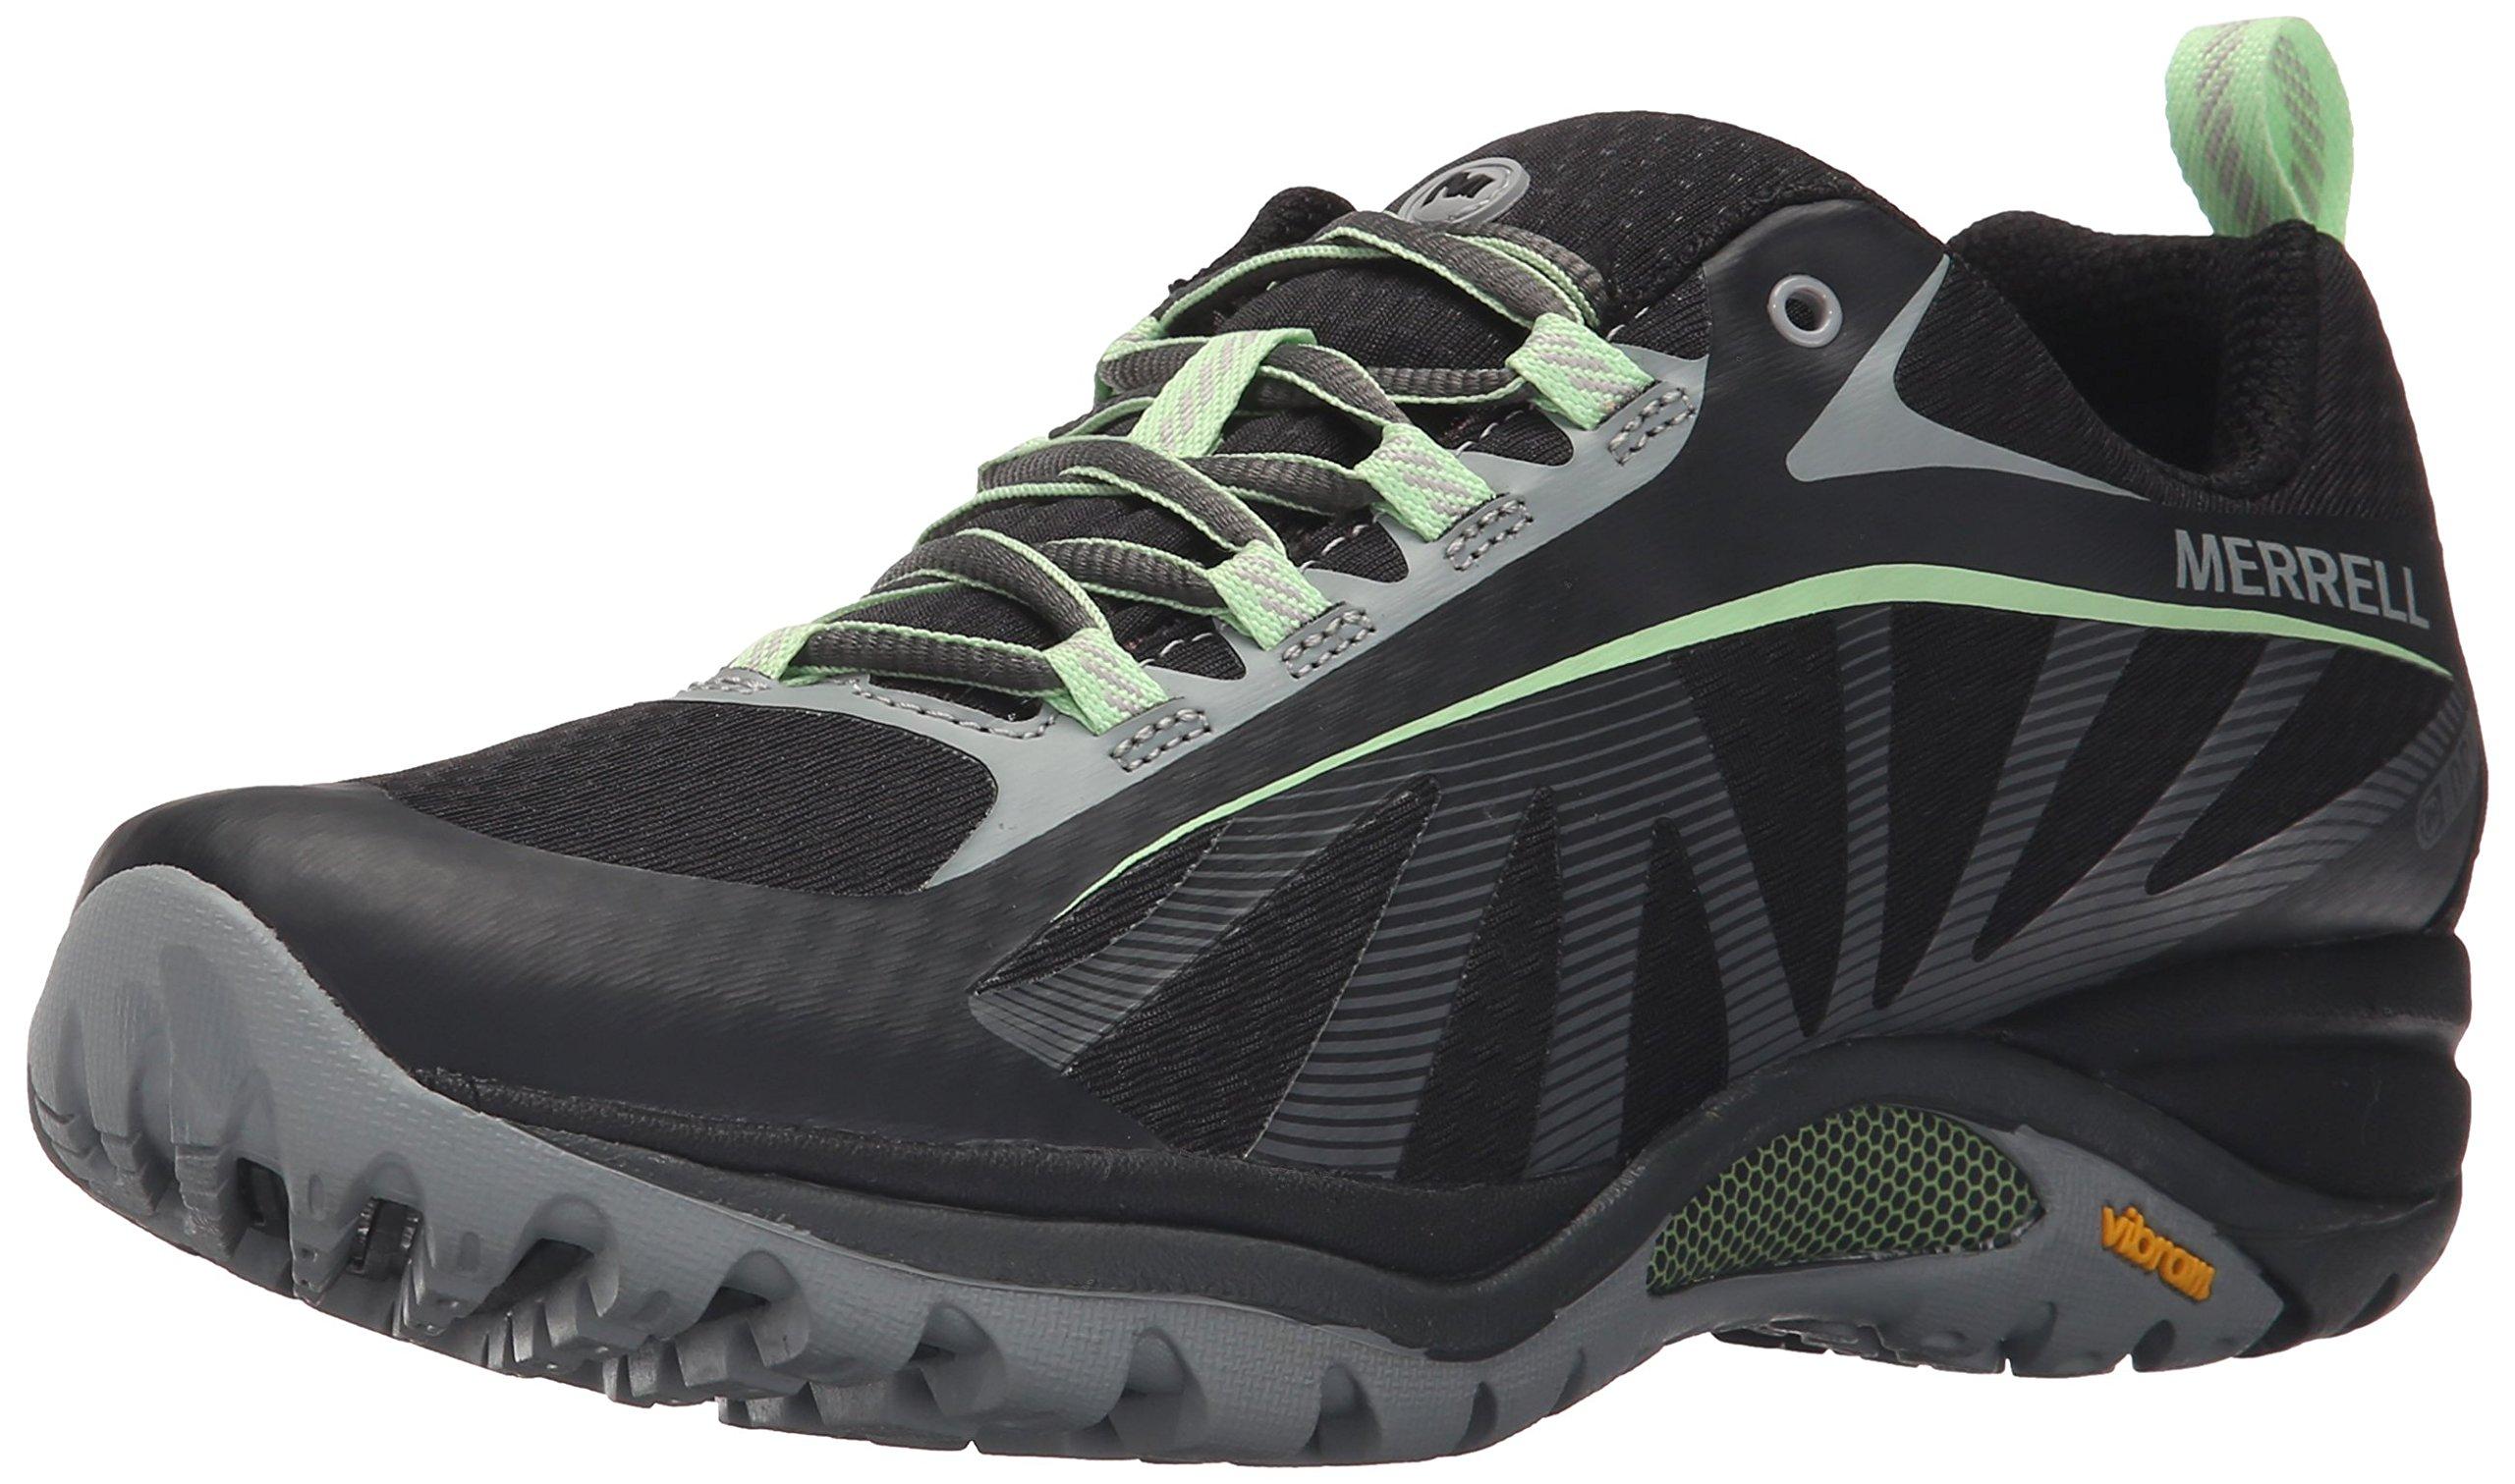 Merrell Women's Siren Edge Waterproof Hiking Shoe, Black/Paradise, 8 M US